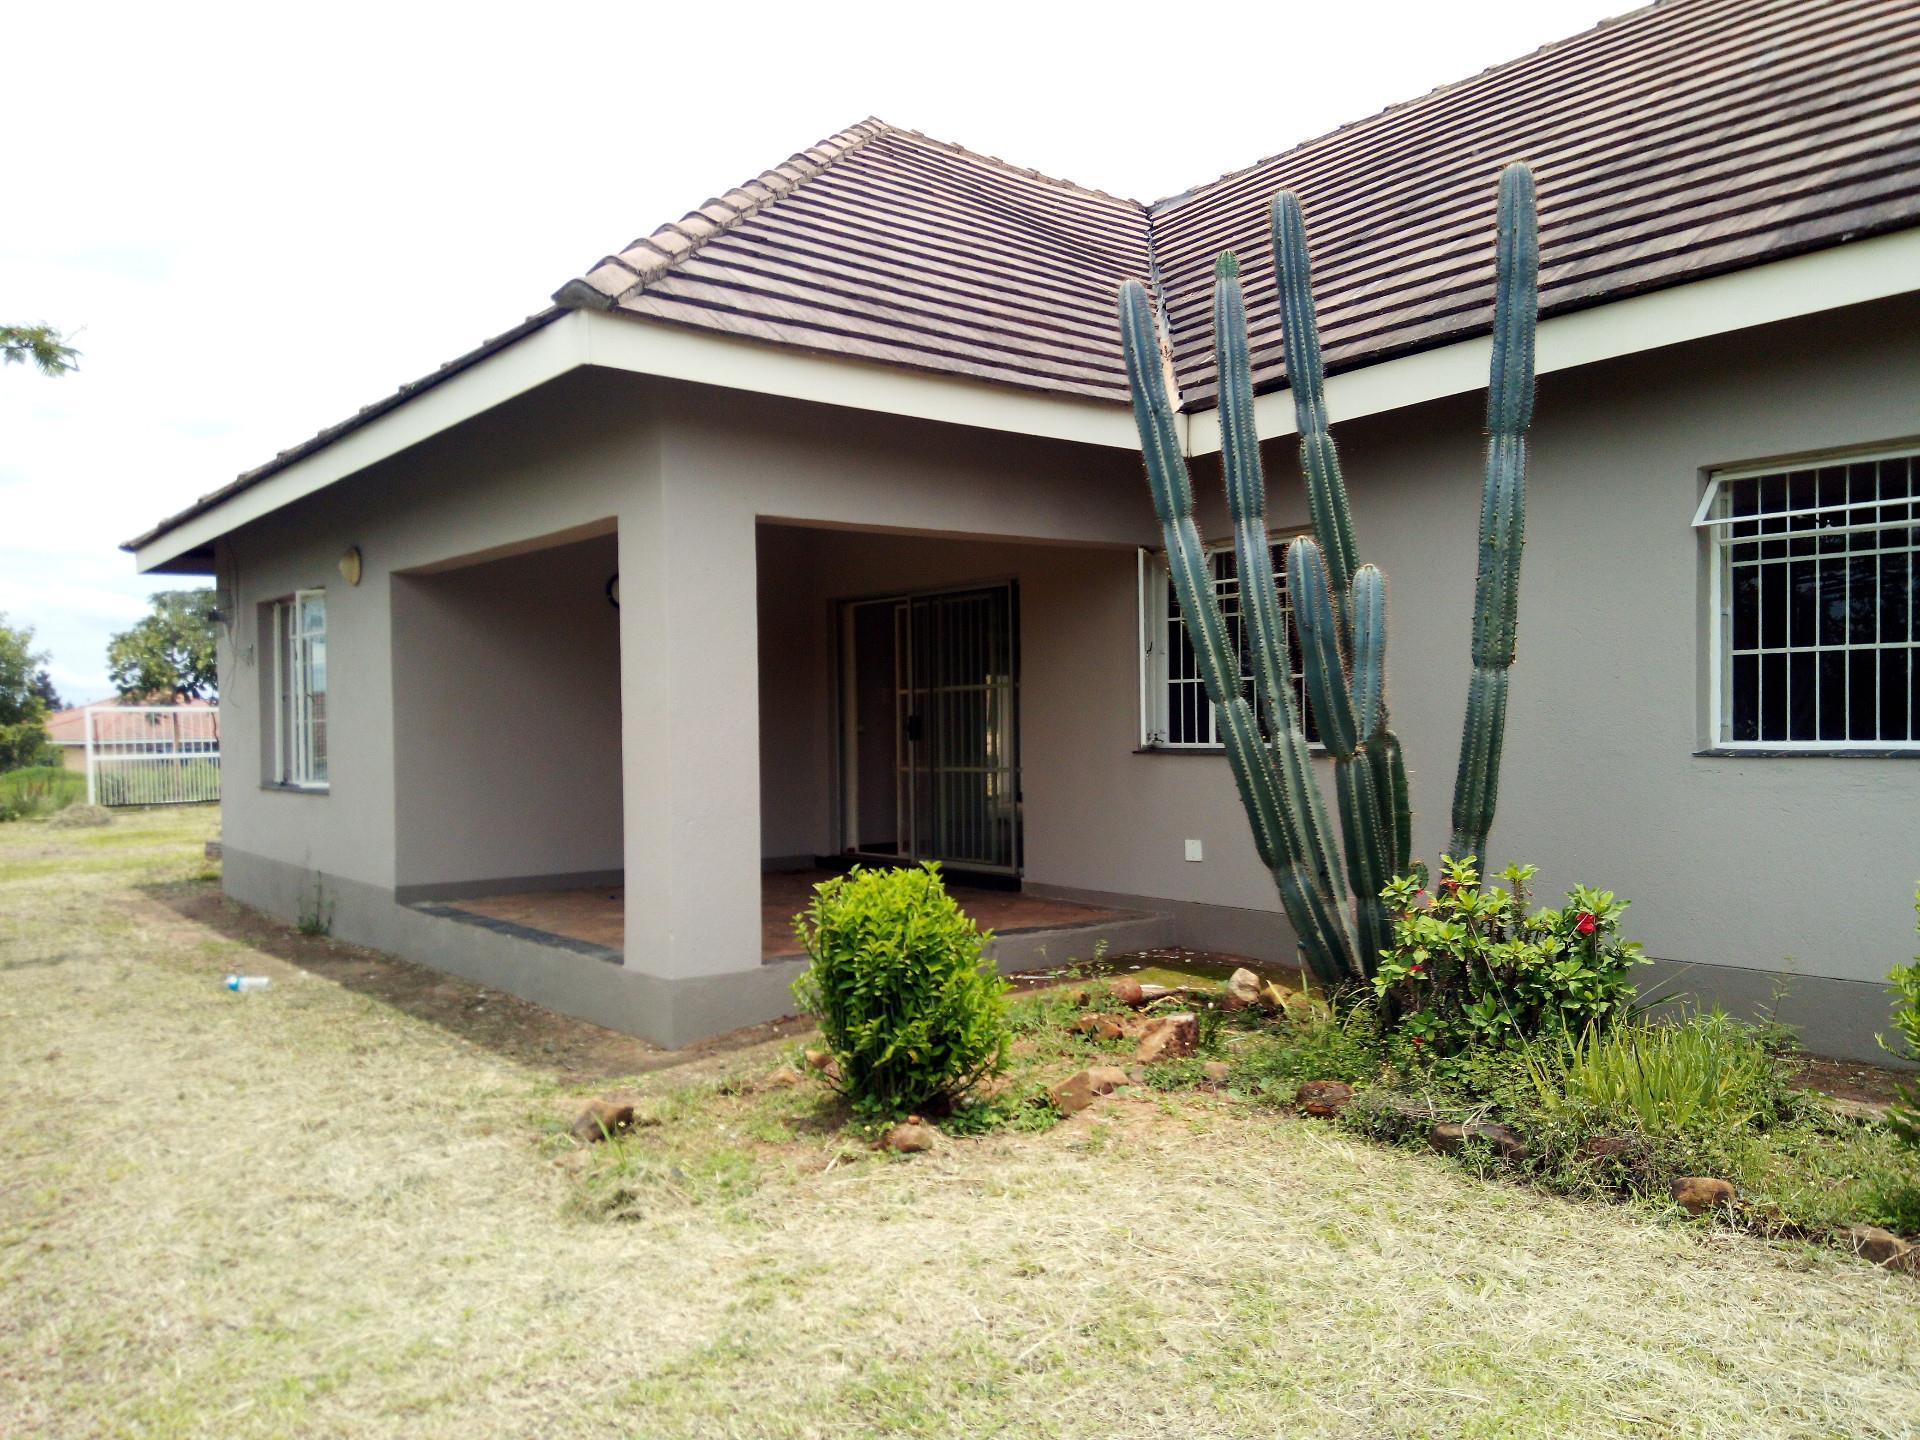 3 Bedroom House To Rent in Matsapha